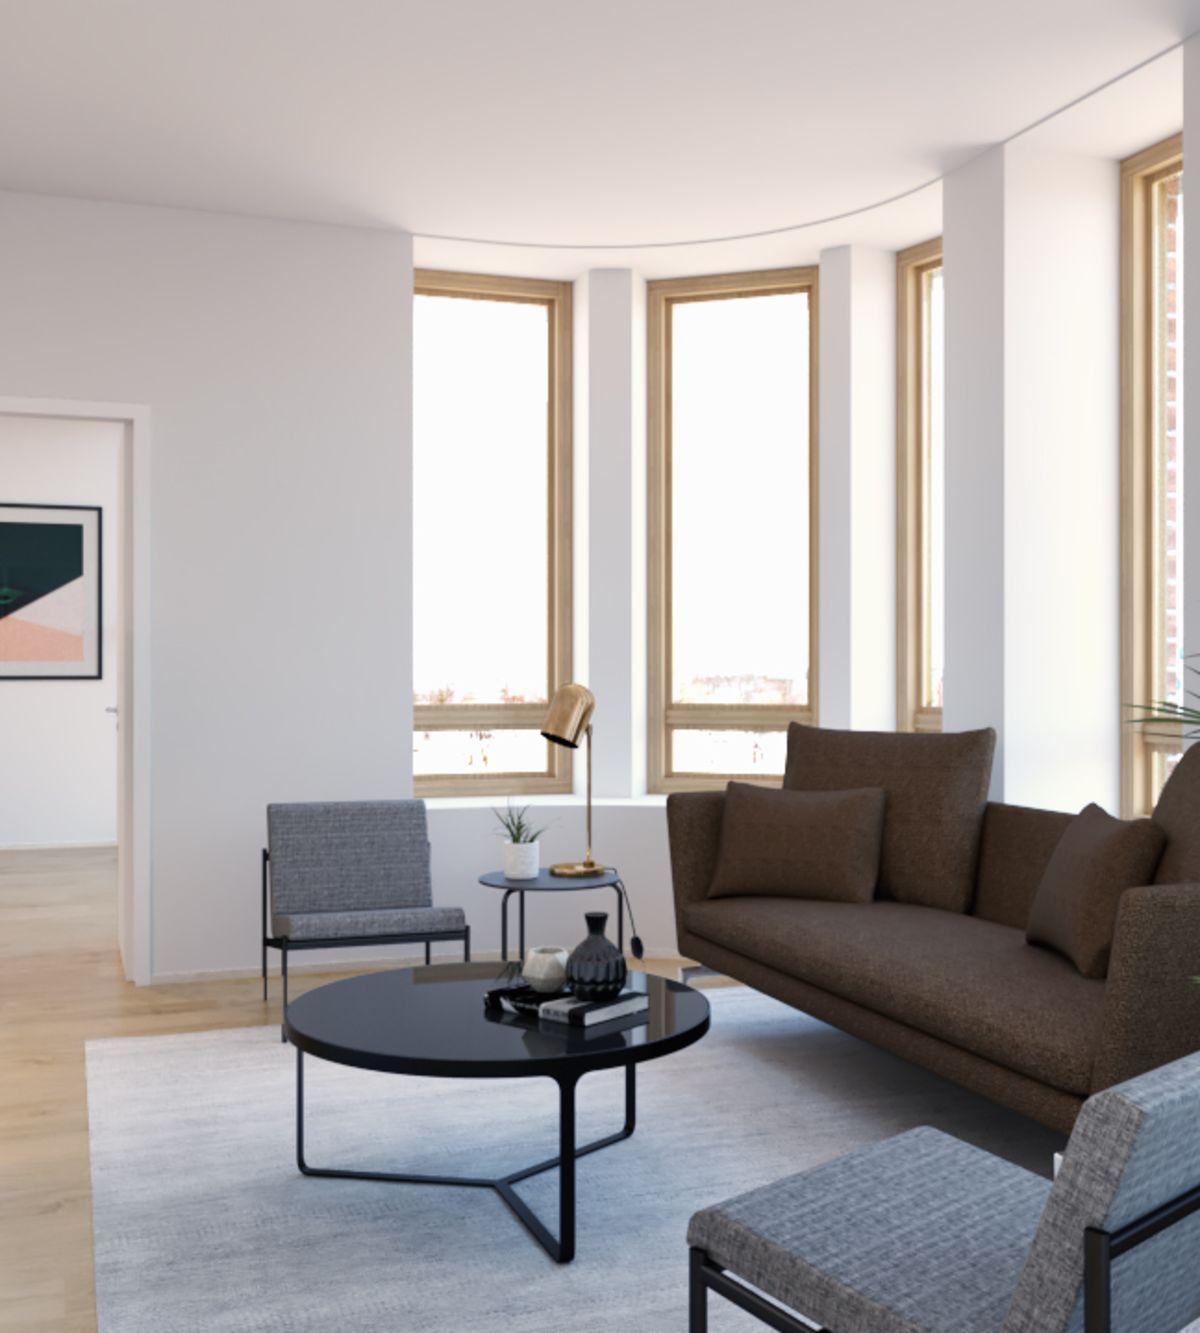 Artek Helsinki furnished tree apartments virtually